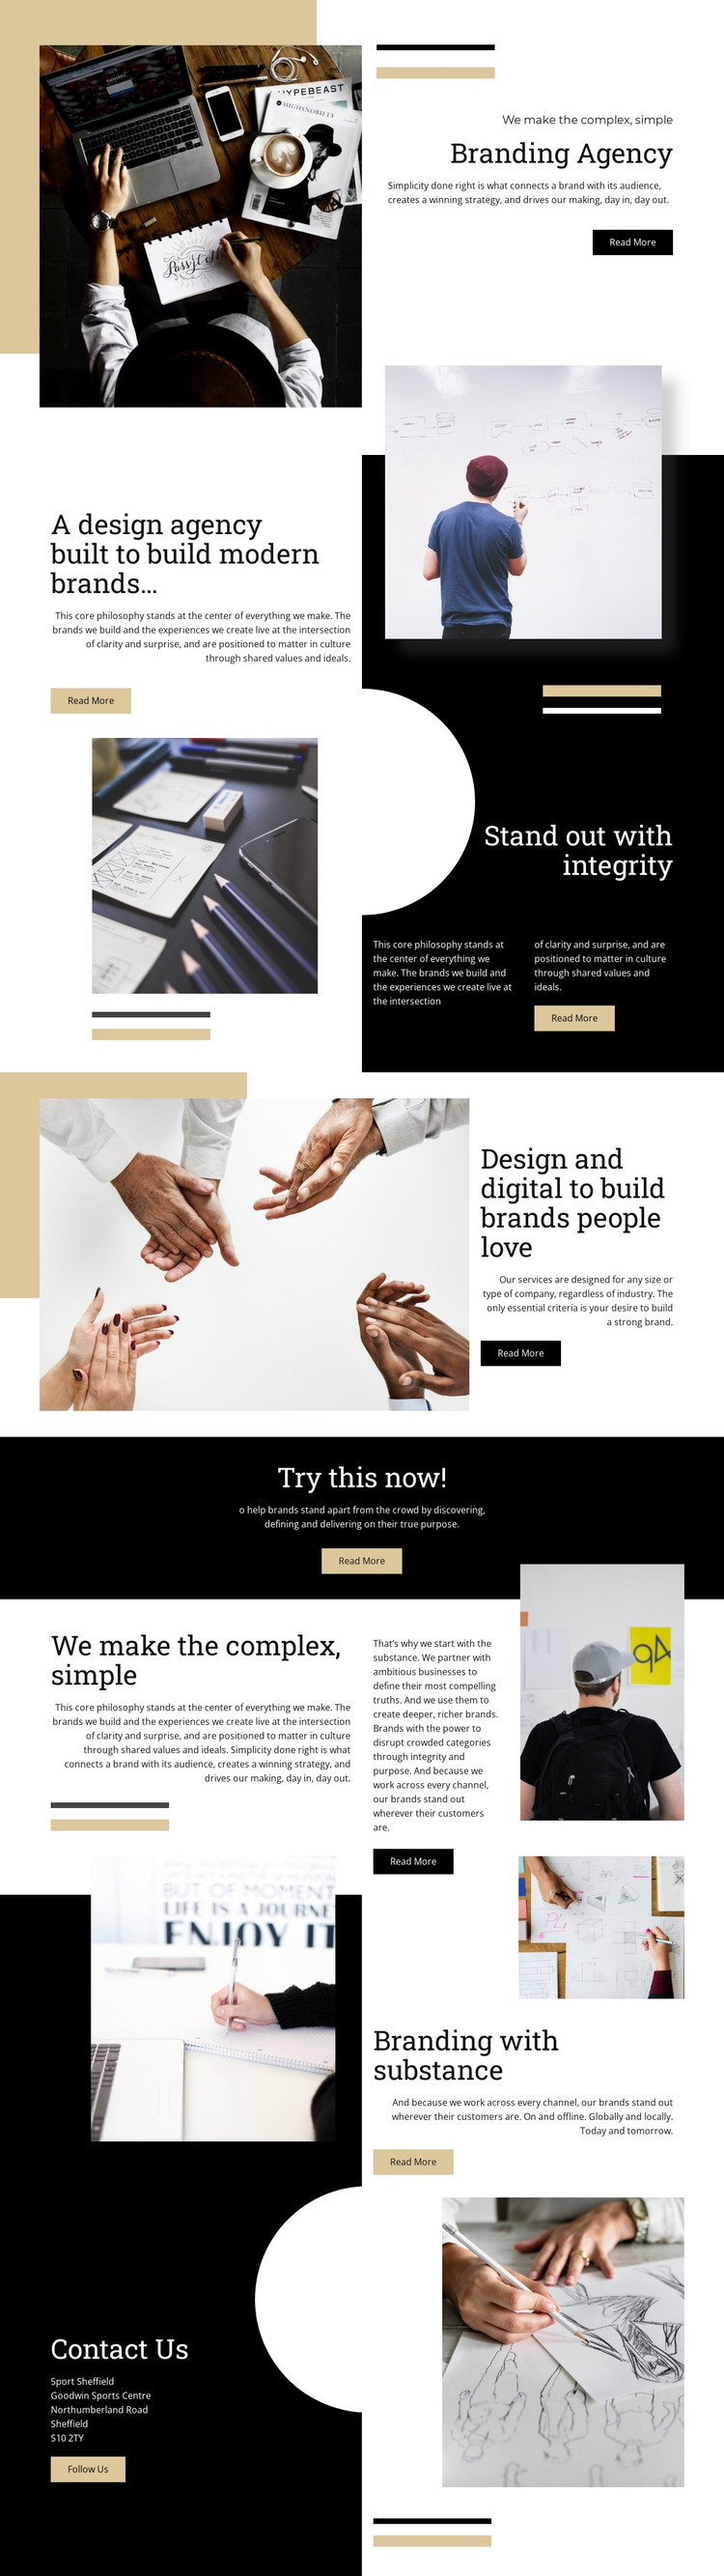 Branding Agency Woocommerce Theme